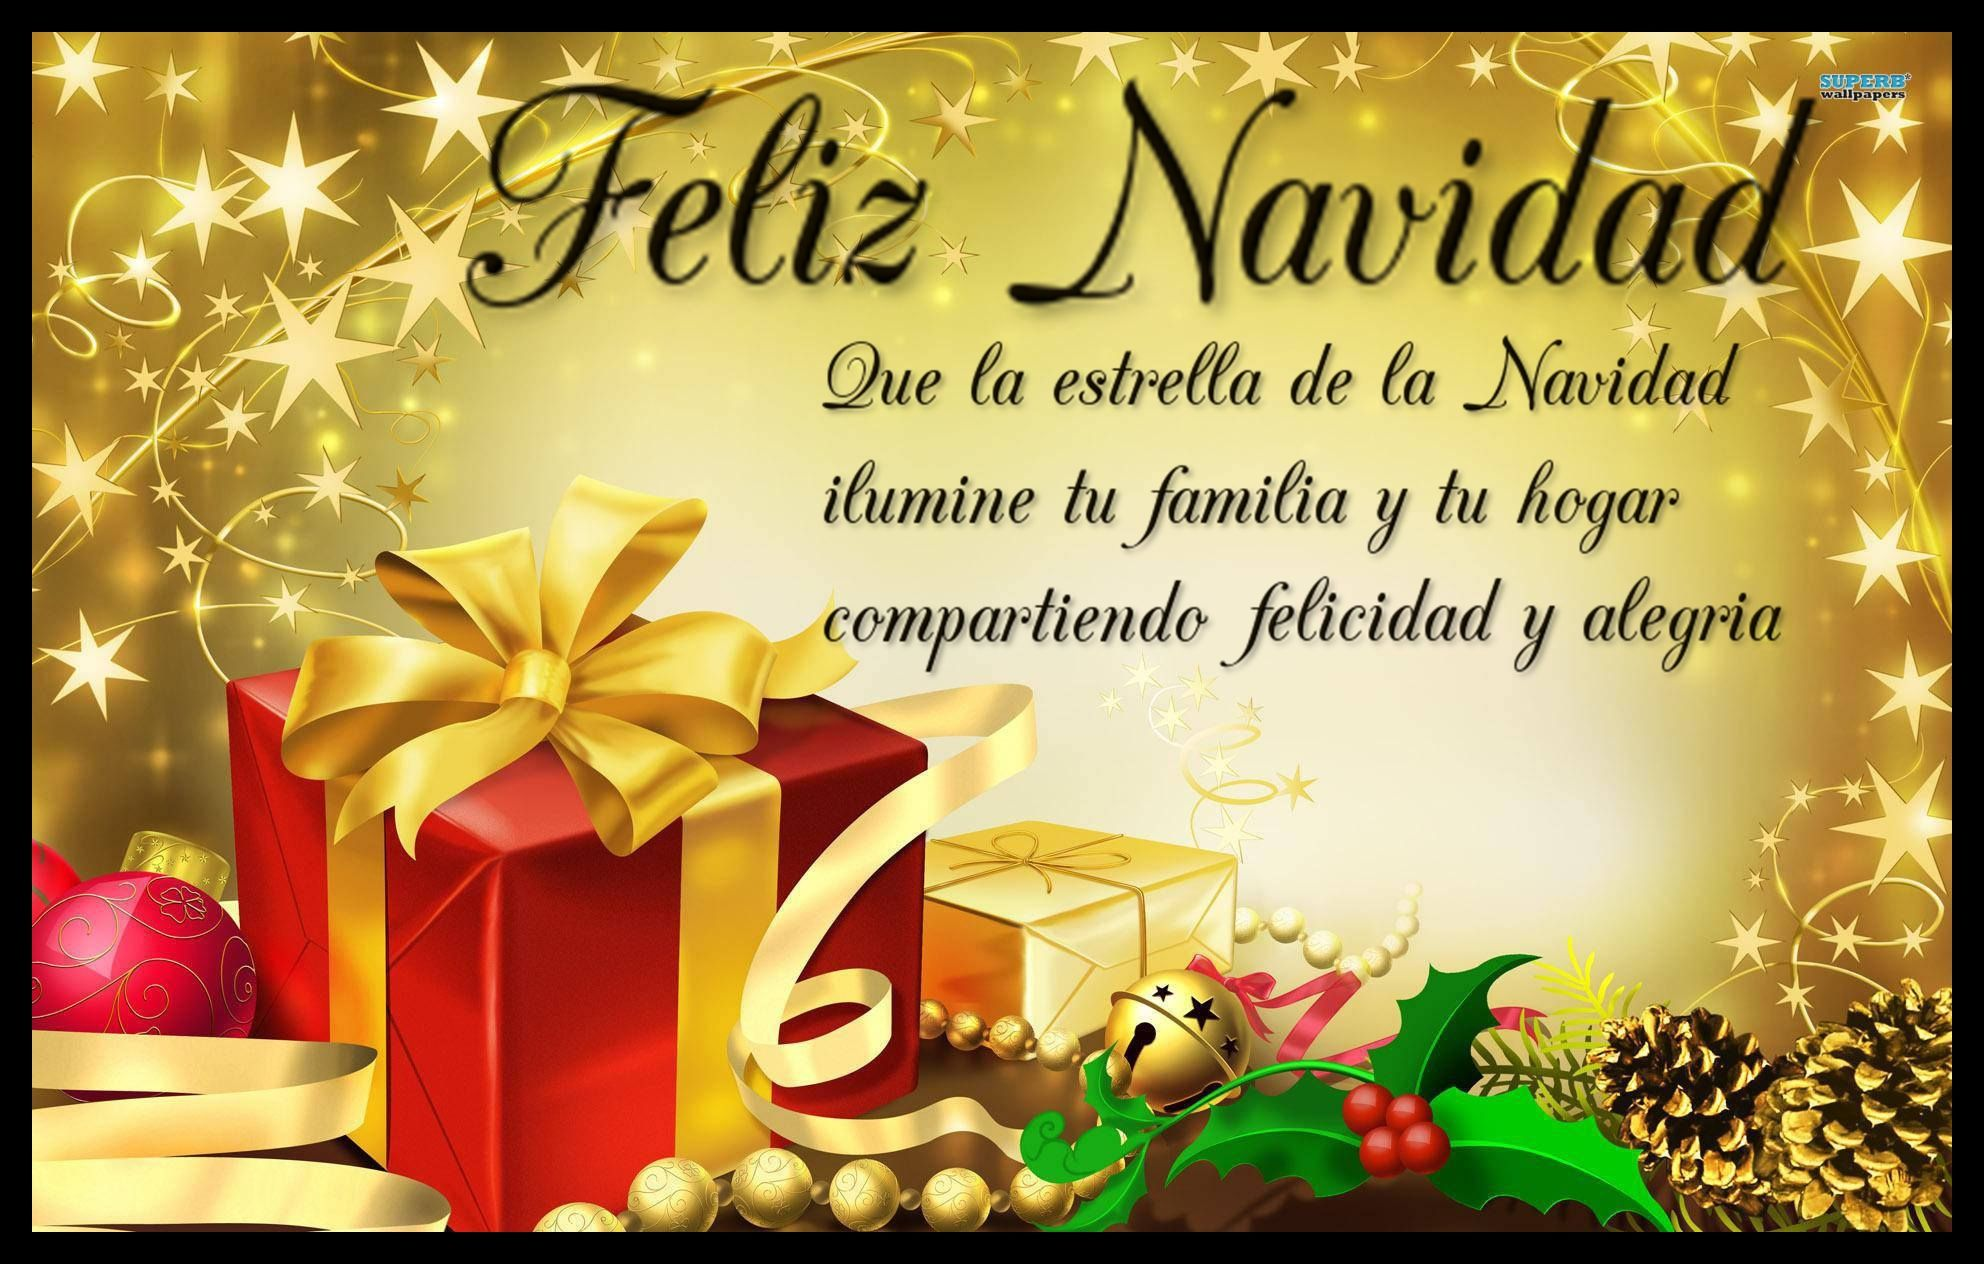 Mensajes navideños para amigos 6 - http ...